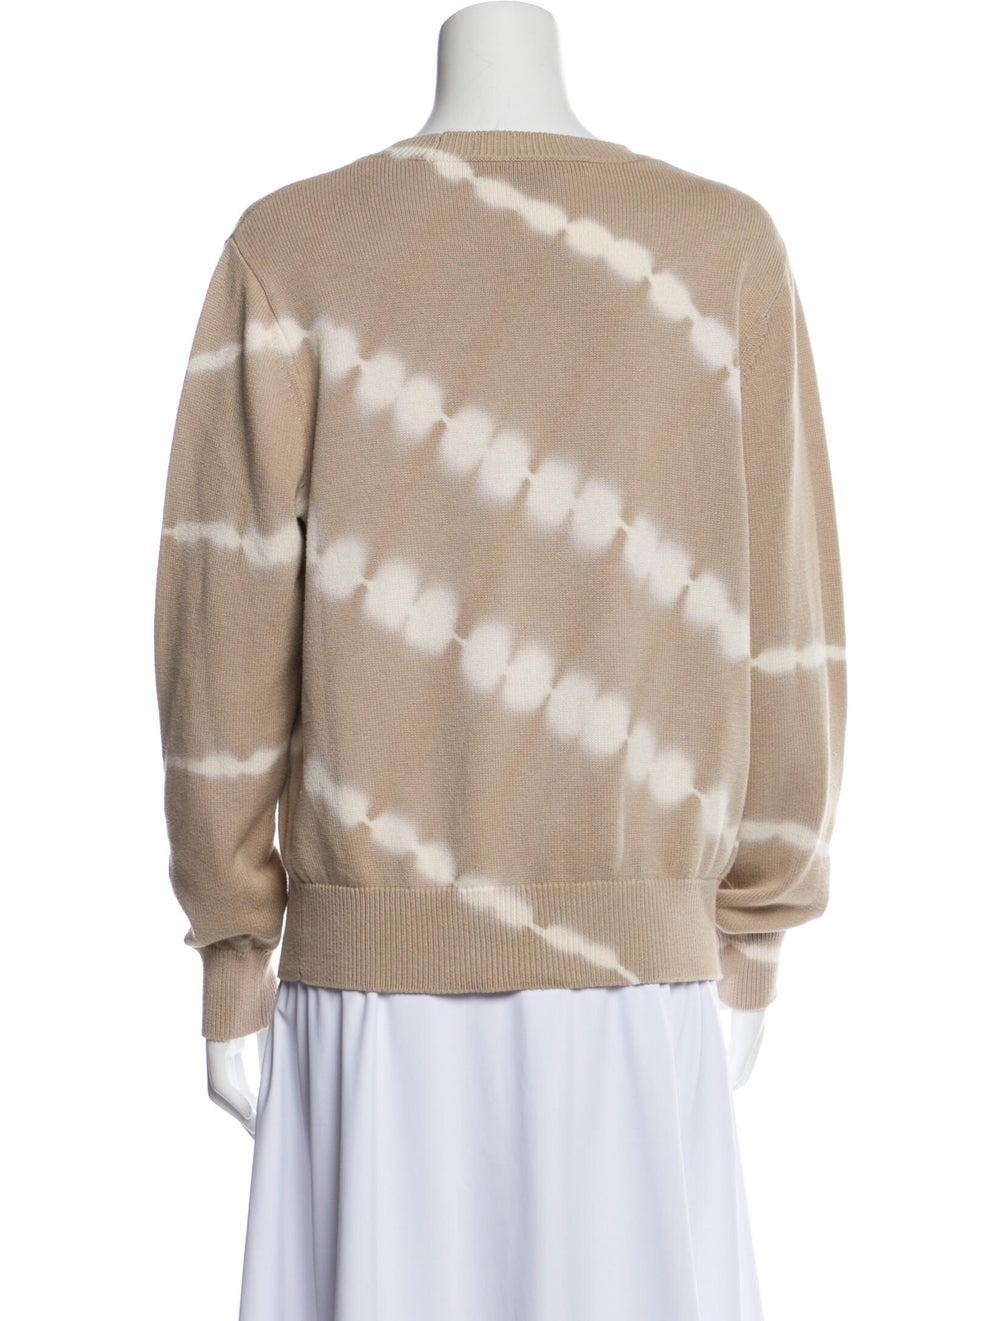 Veronica Beard Tie-Dye Print Crew Neck Sweater - image 3